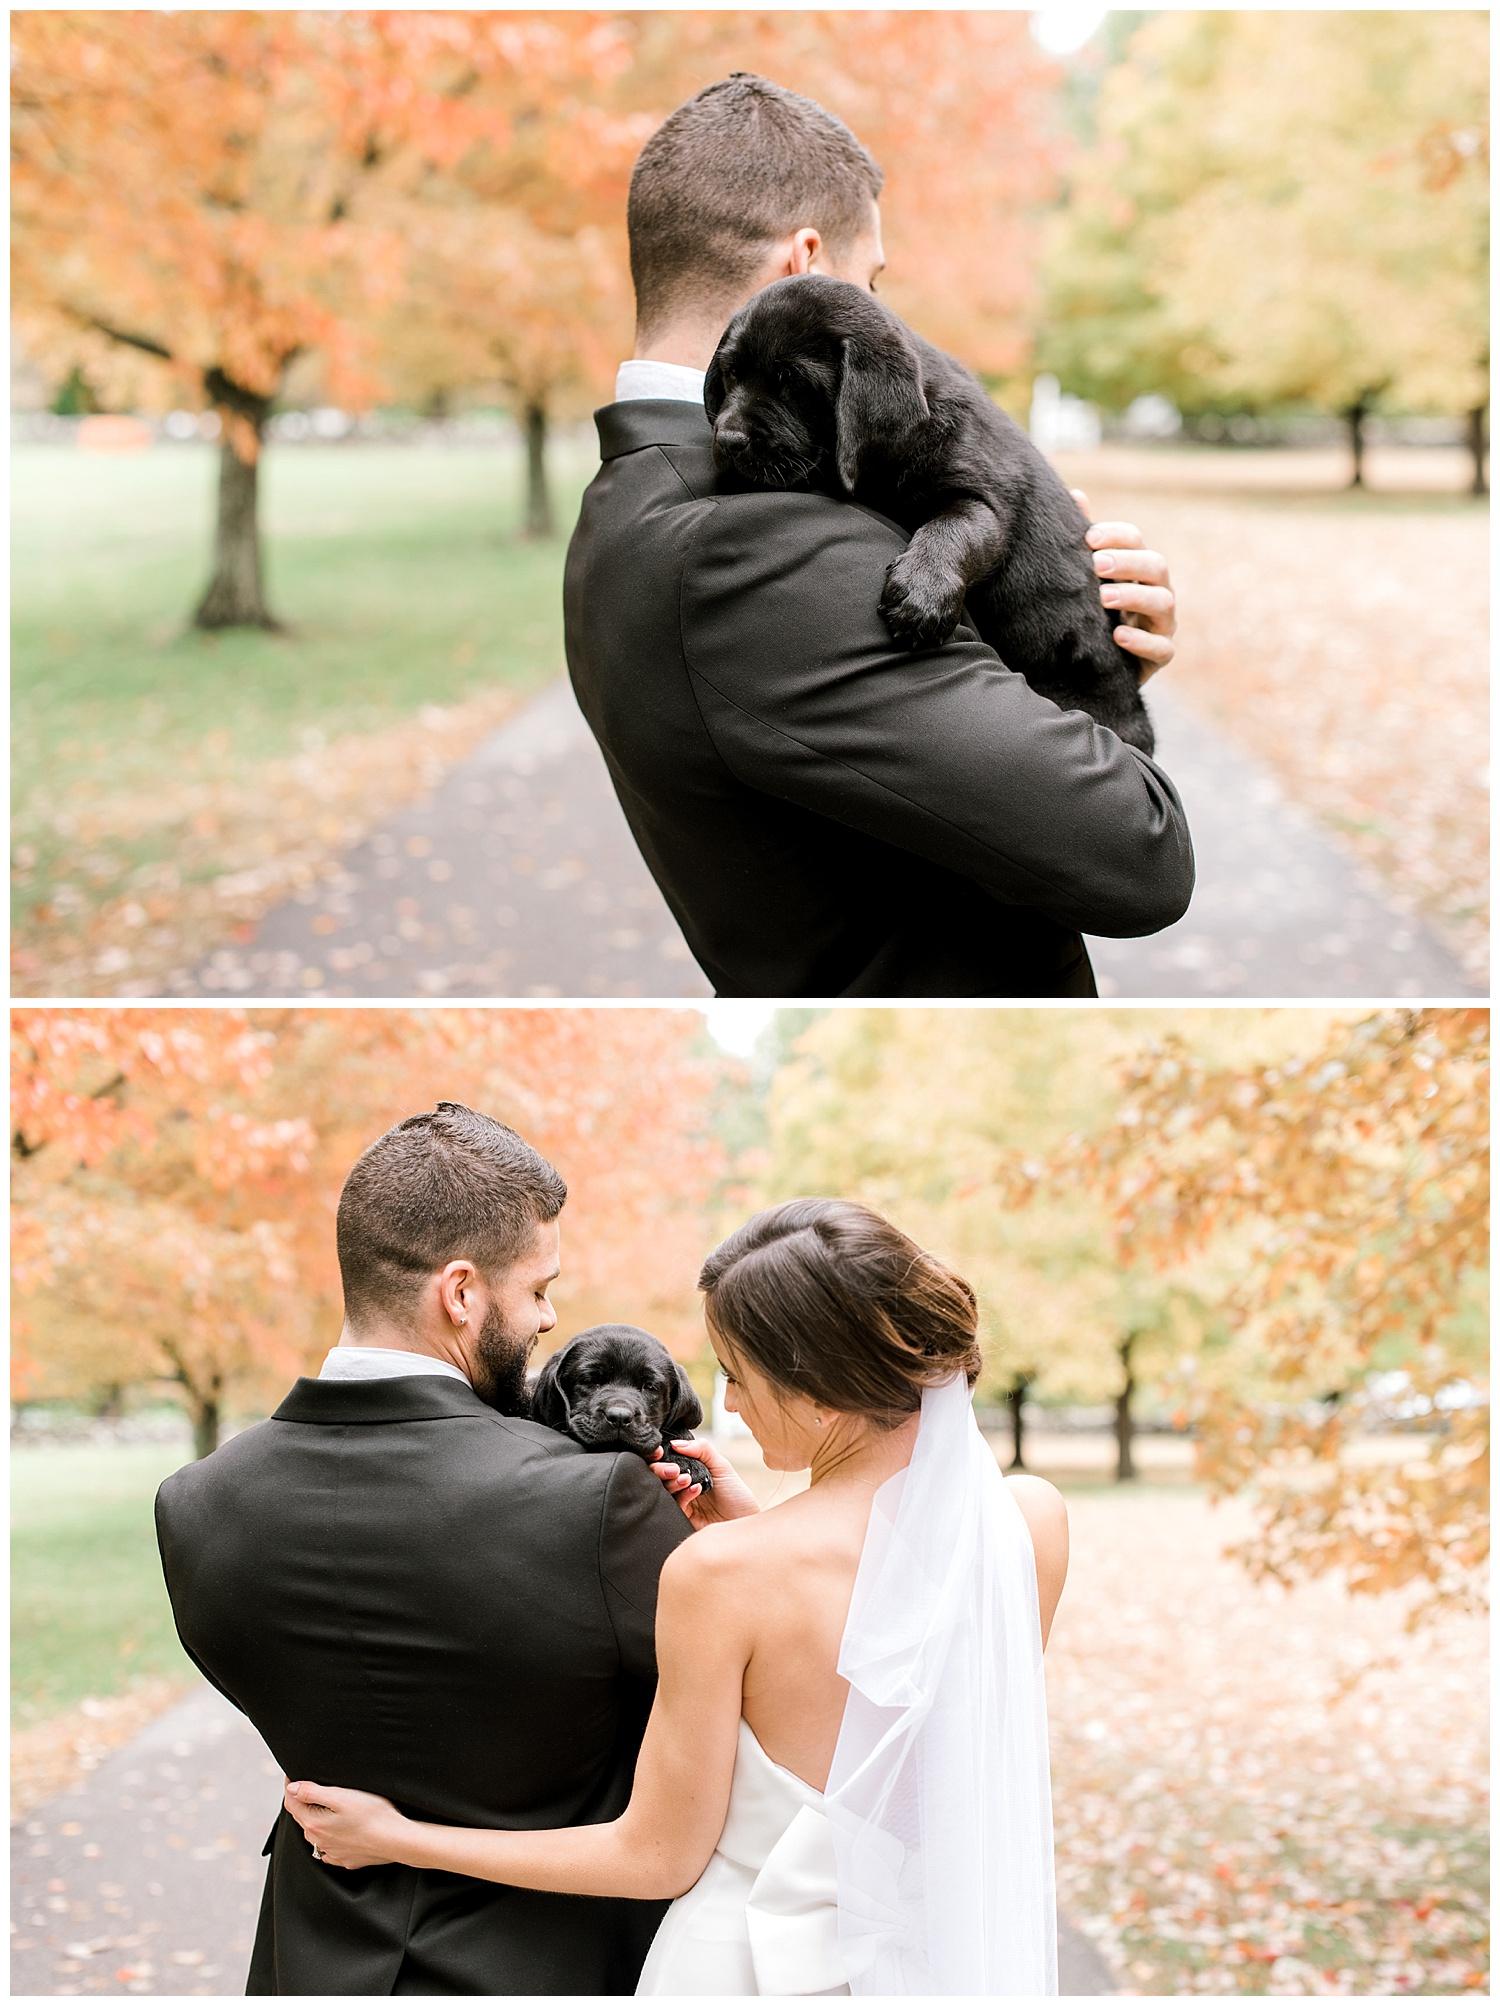 pompositticut-farm-fall-wedding-photography-hudson-massachusetts-photo-20.jpg